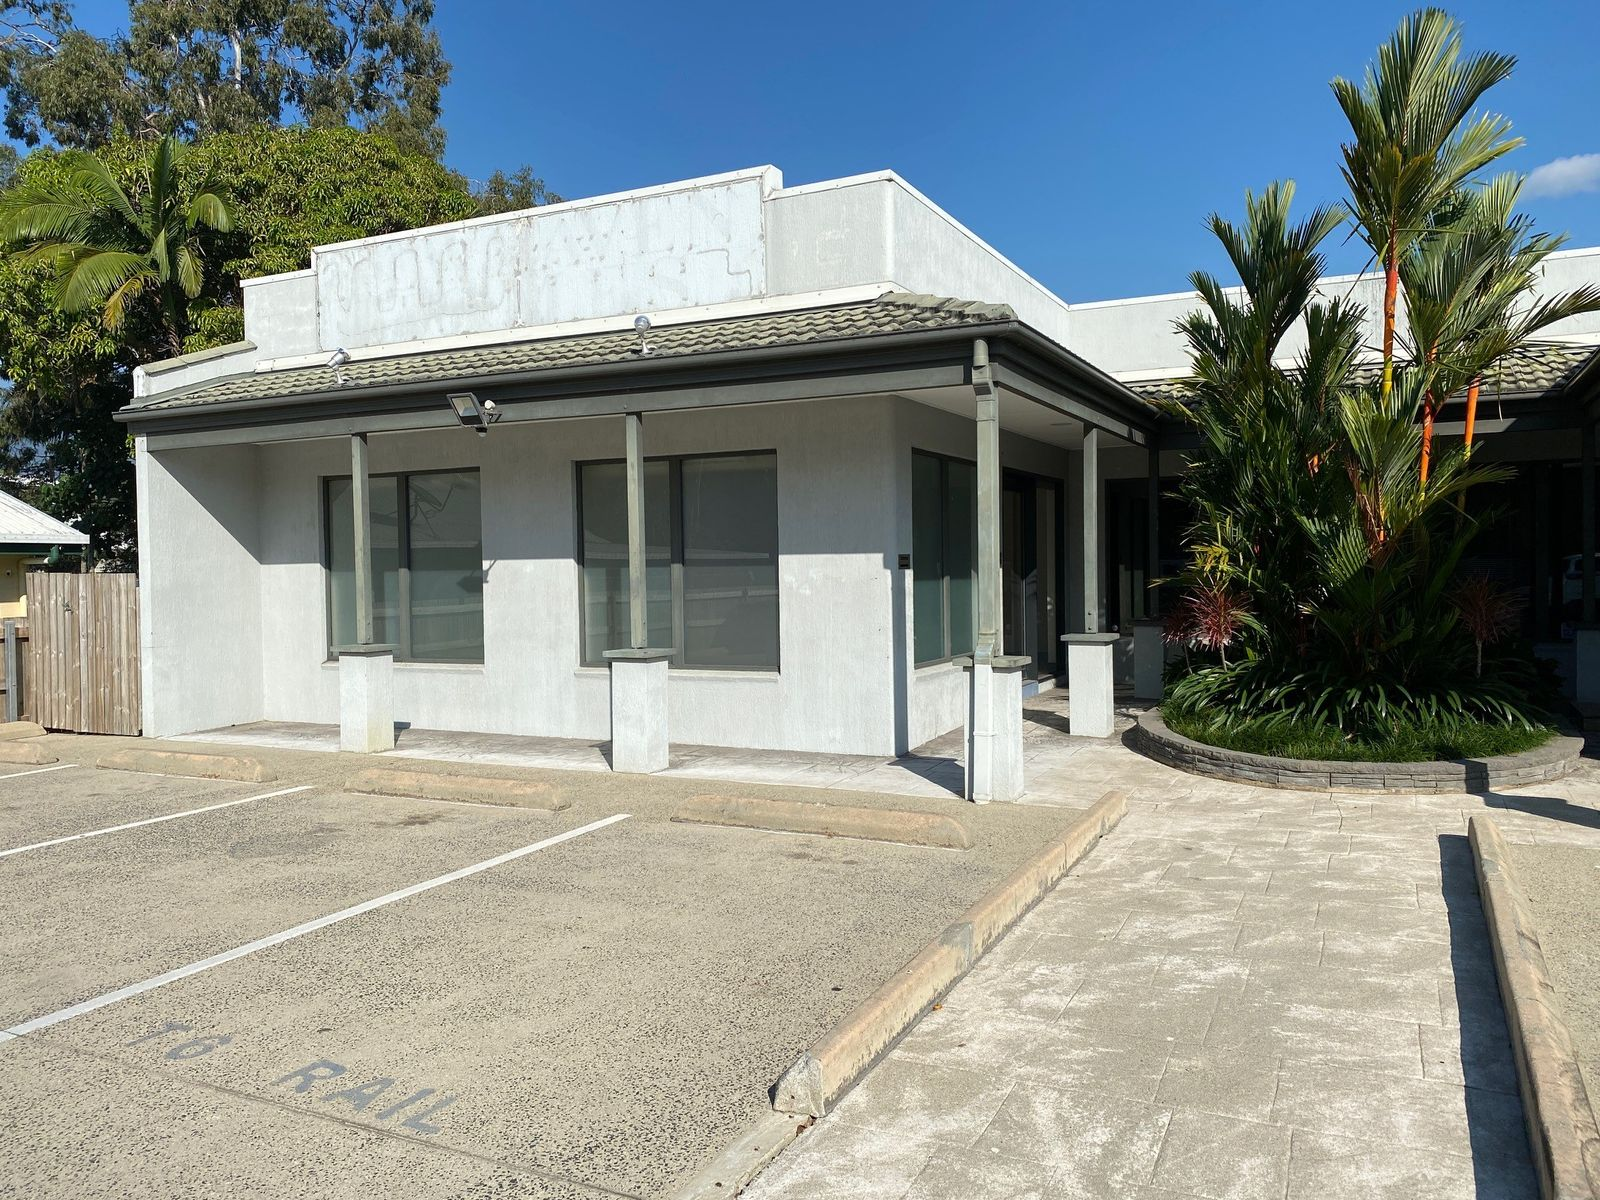 Lot 1/13 Pease Street, Manoora, QLD 4870